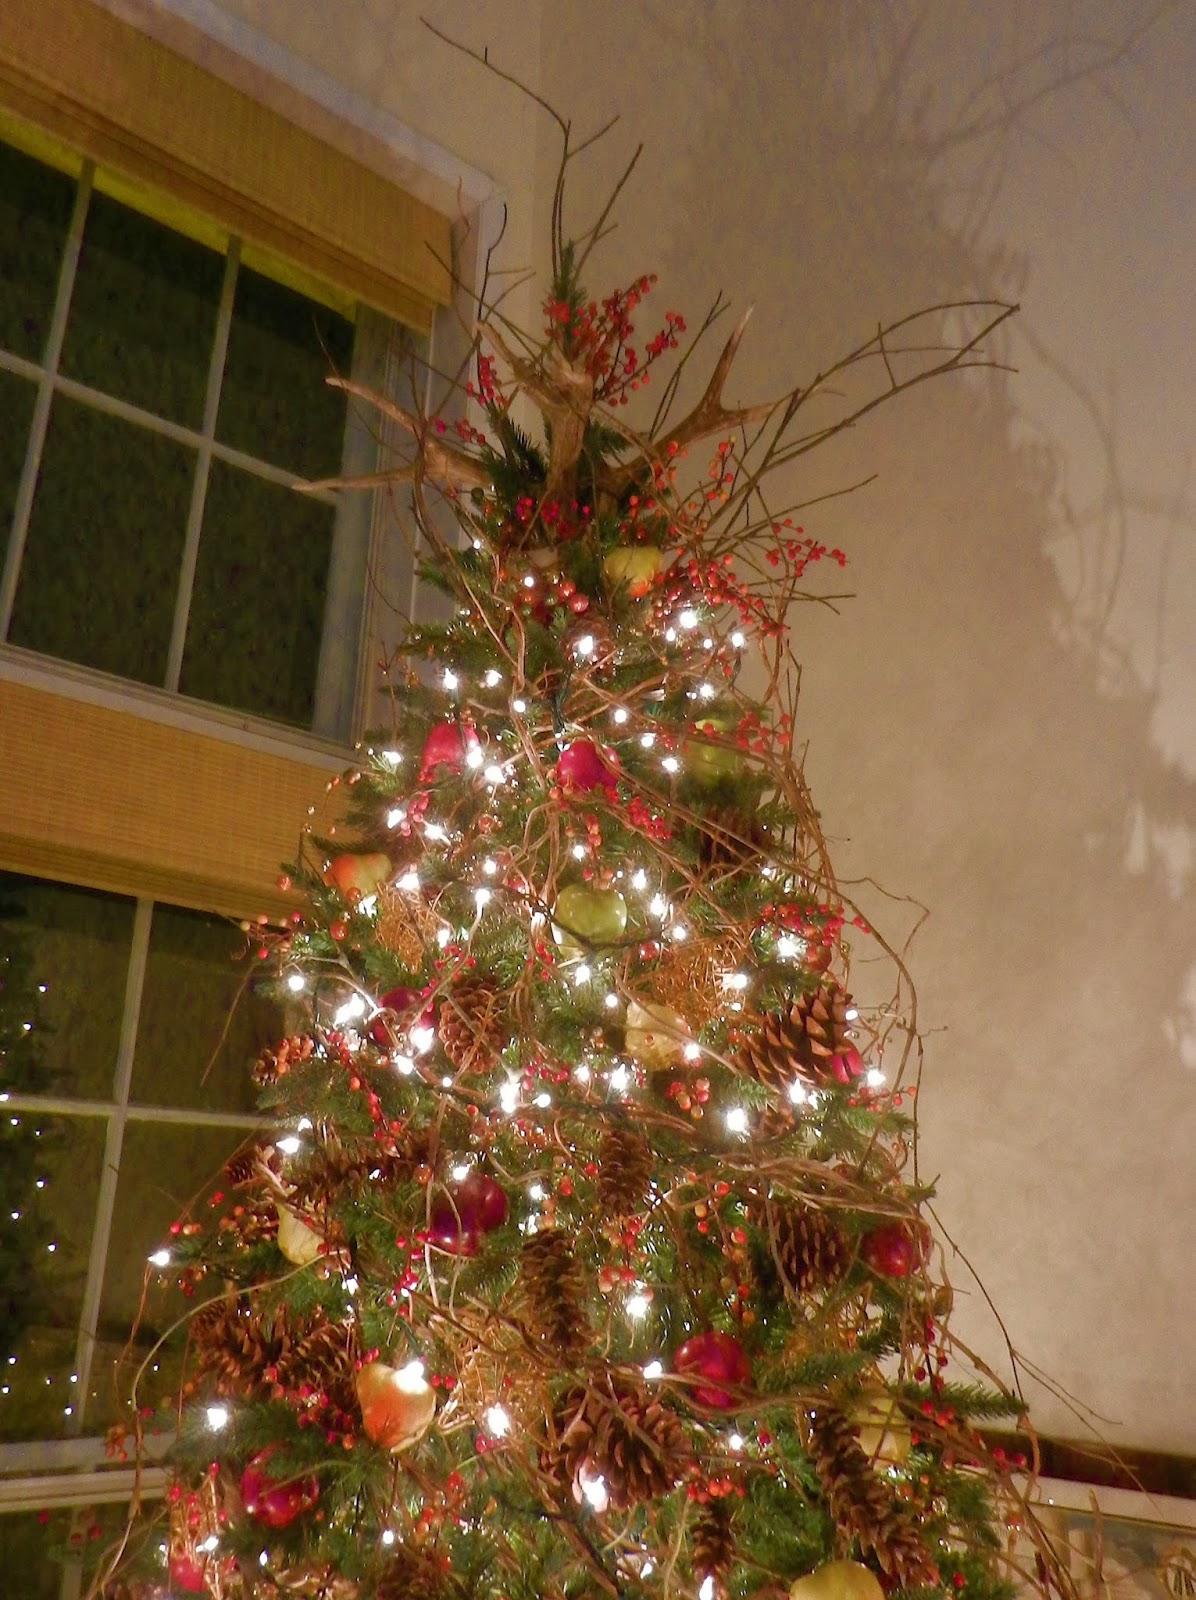 Knickerbocker Style  Design An Elegant NatureInspired Christmas Tree